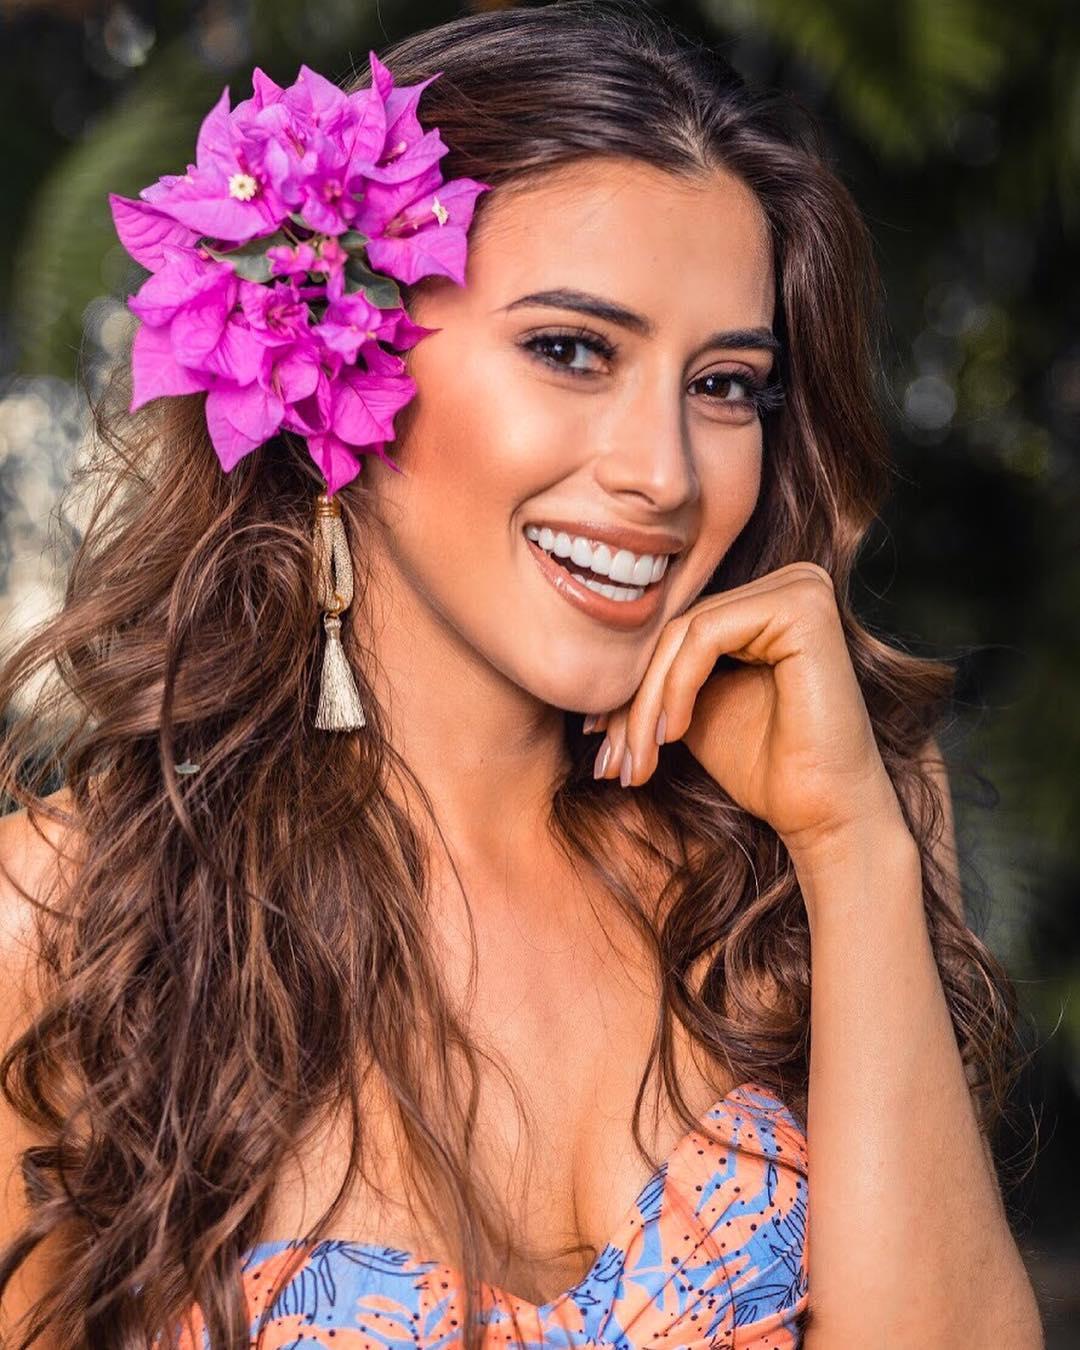 laura claro, primera finalista de reyna hispanoamericana 2019. 46369510